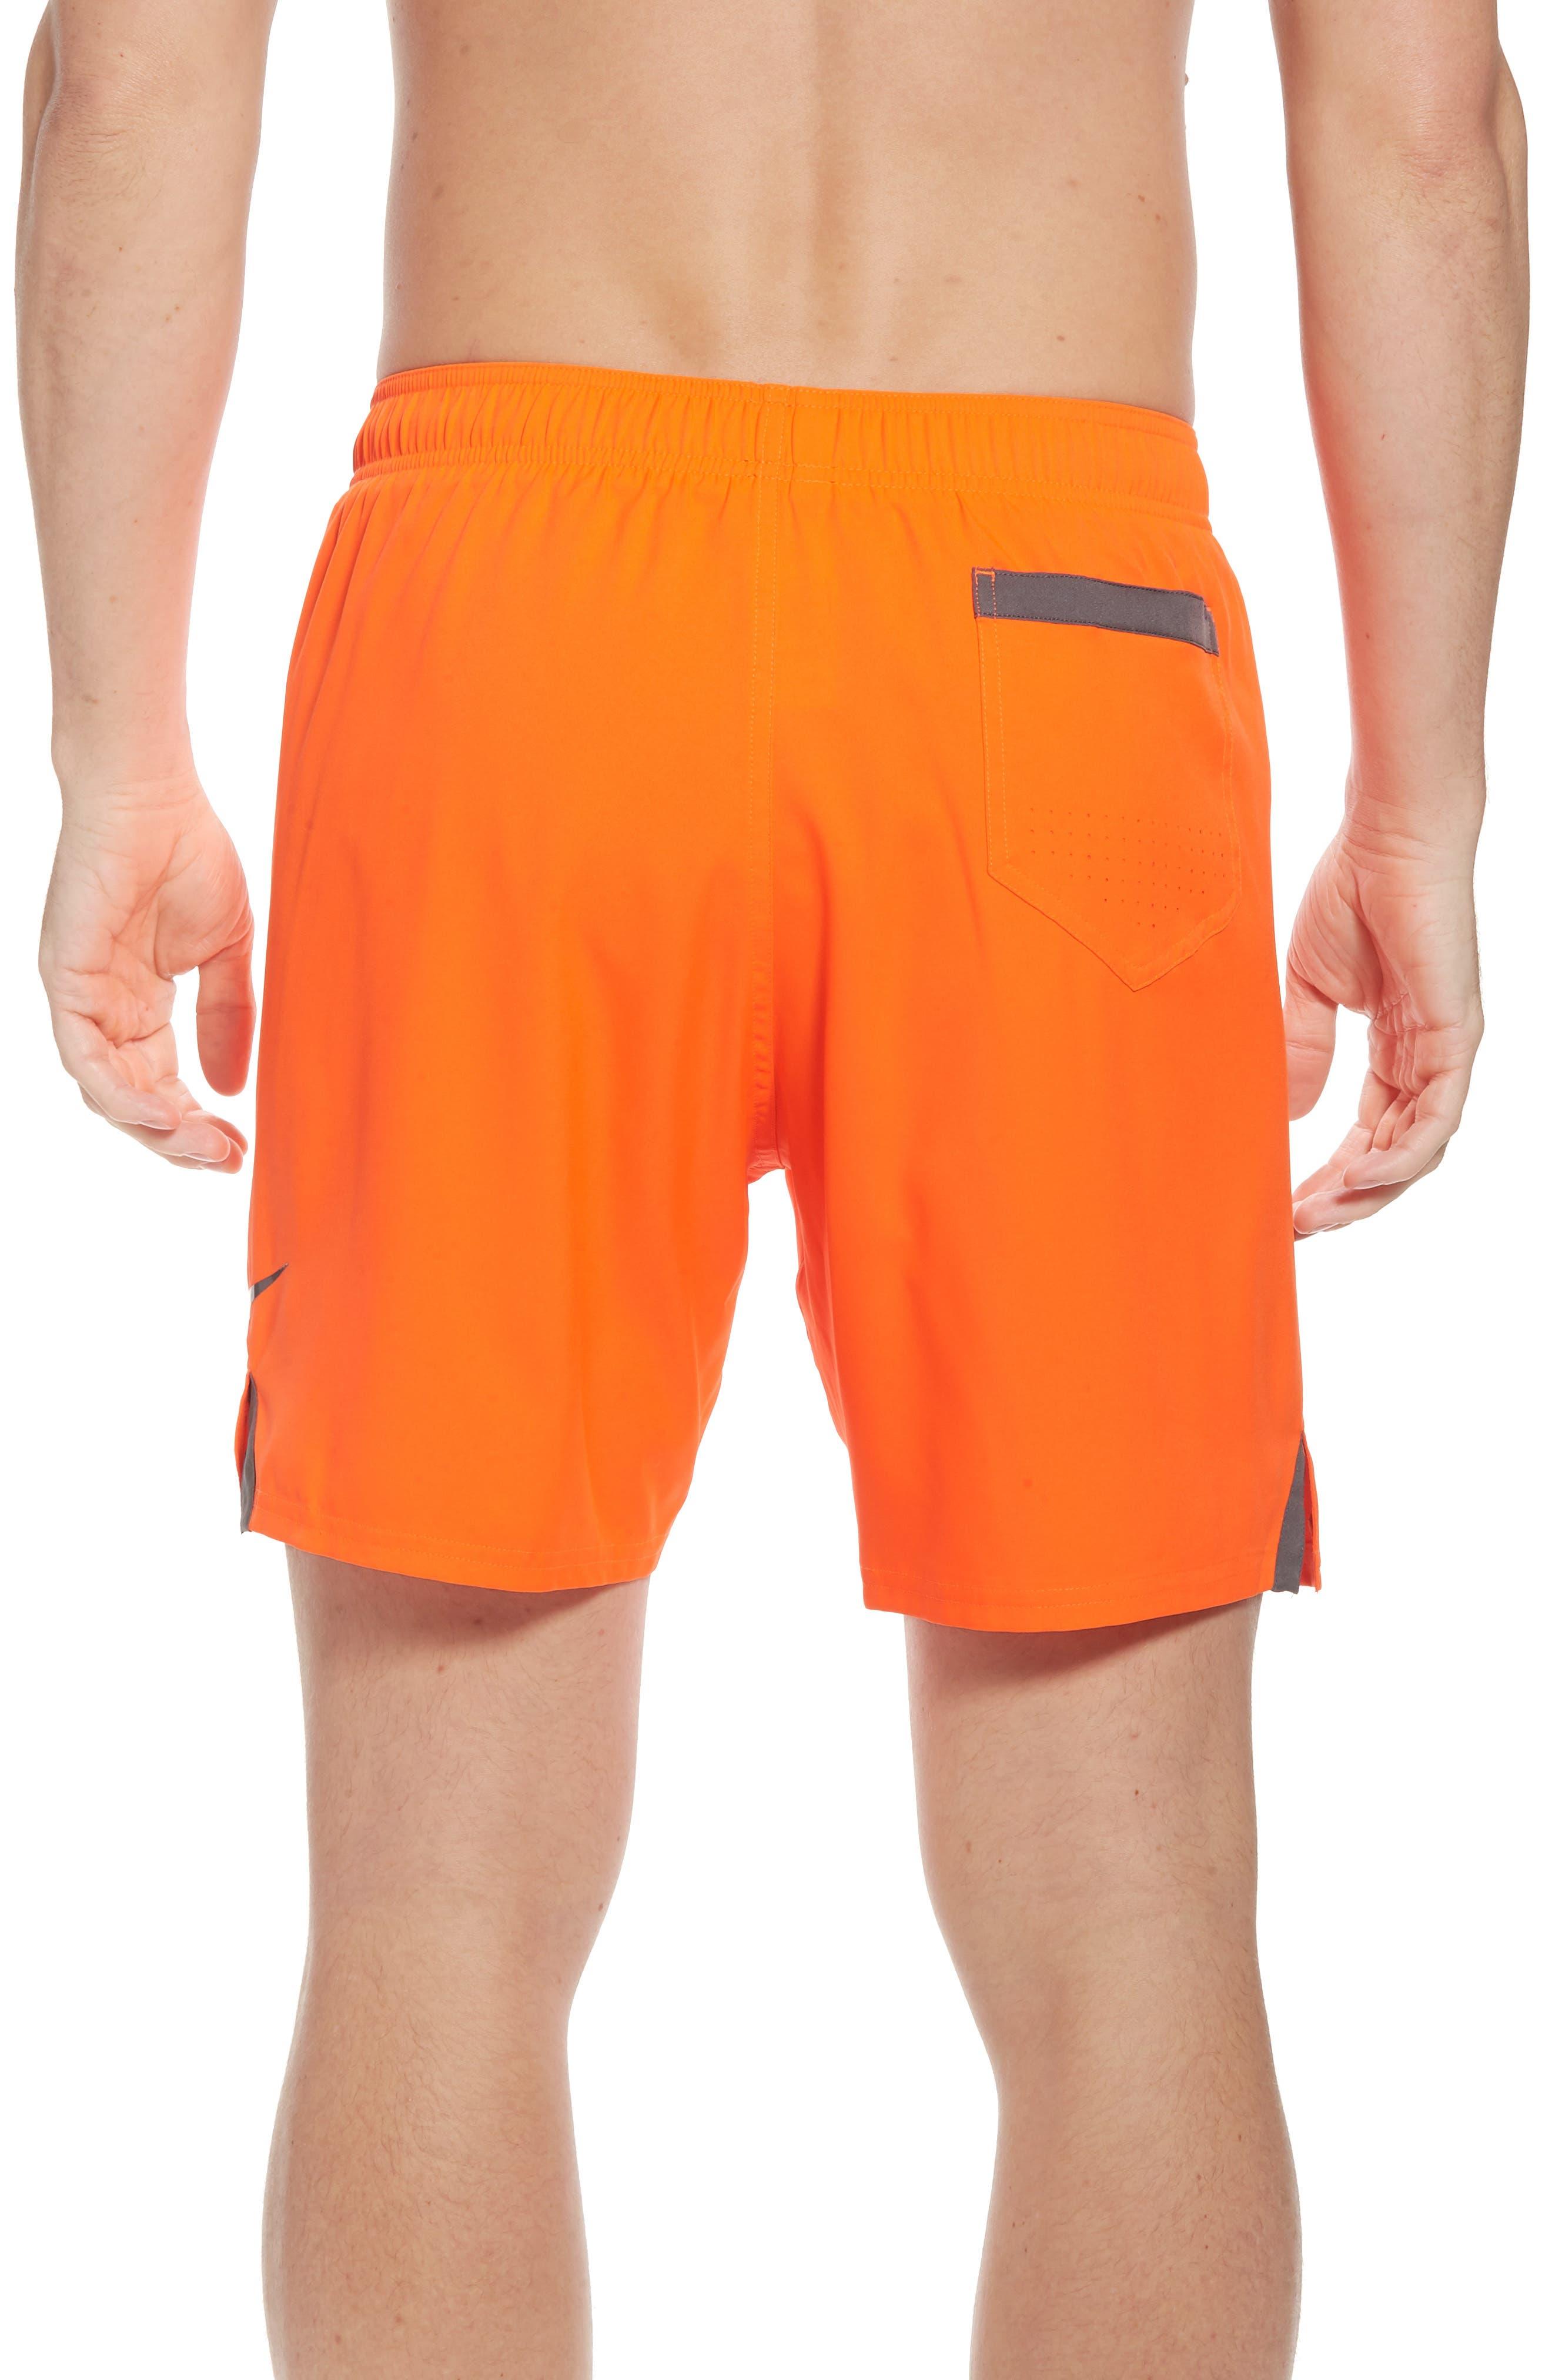 Alternate Image 2  - Nike Vital Swim Trunks